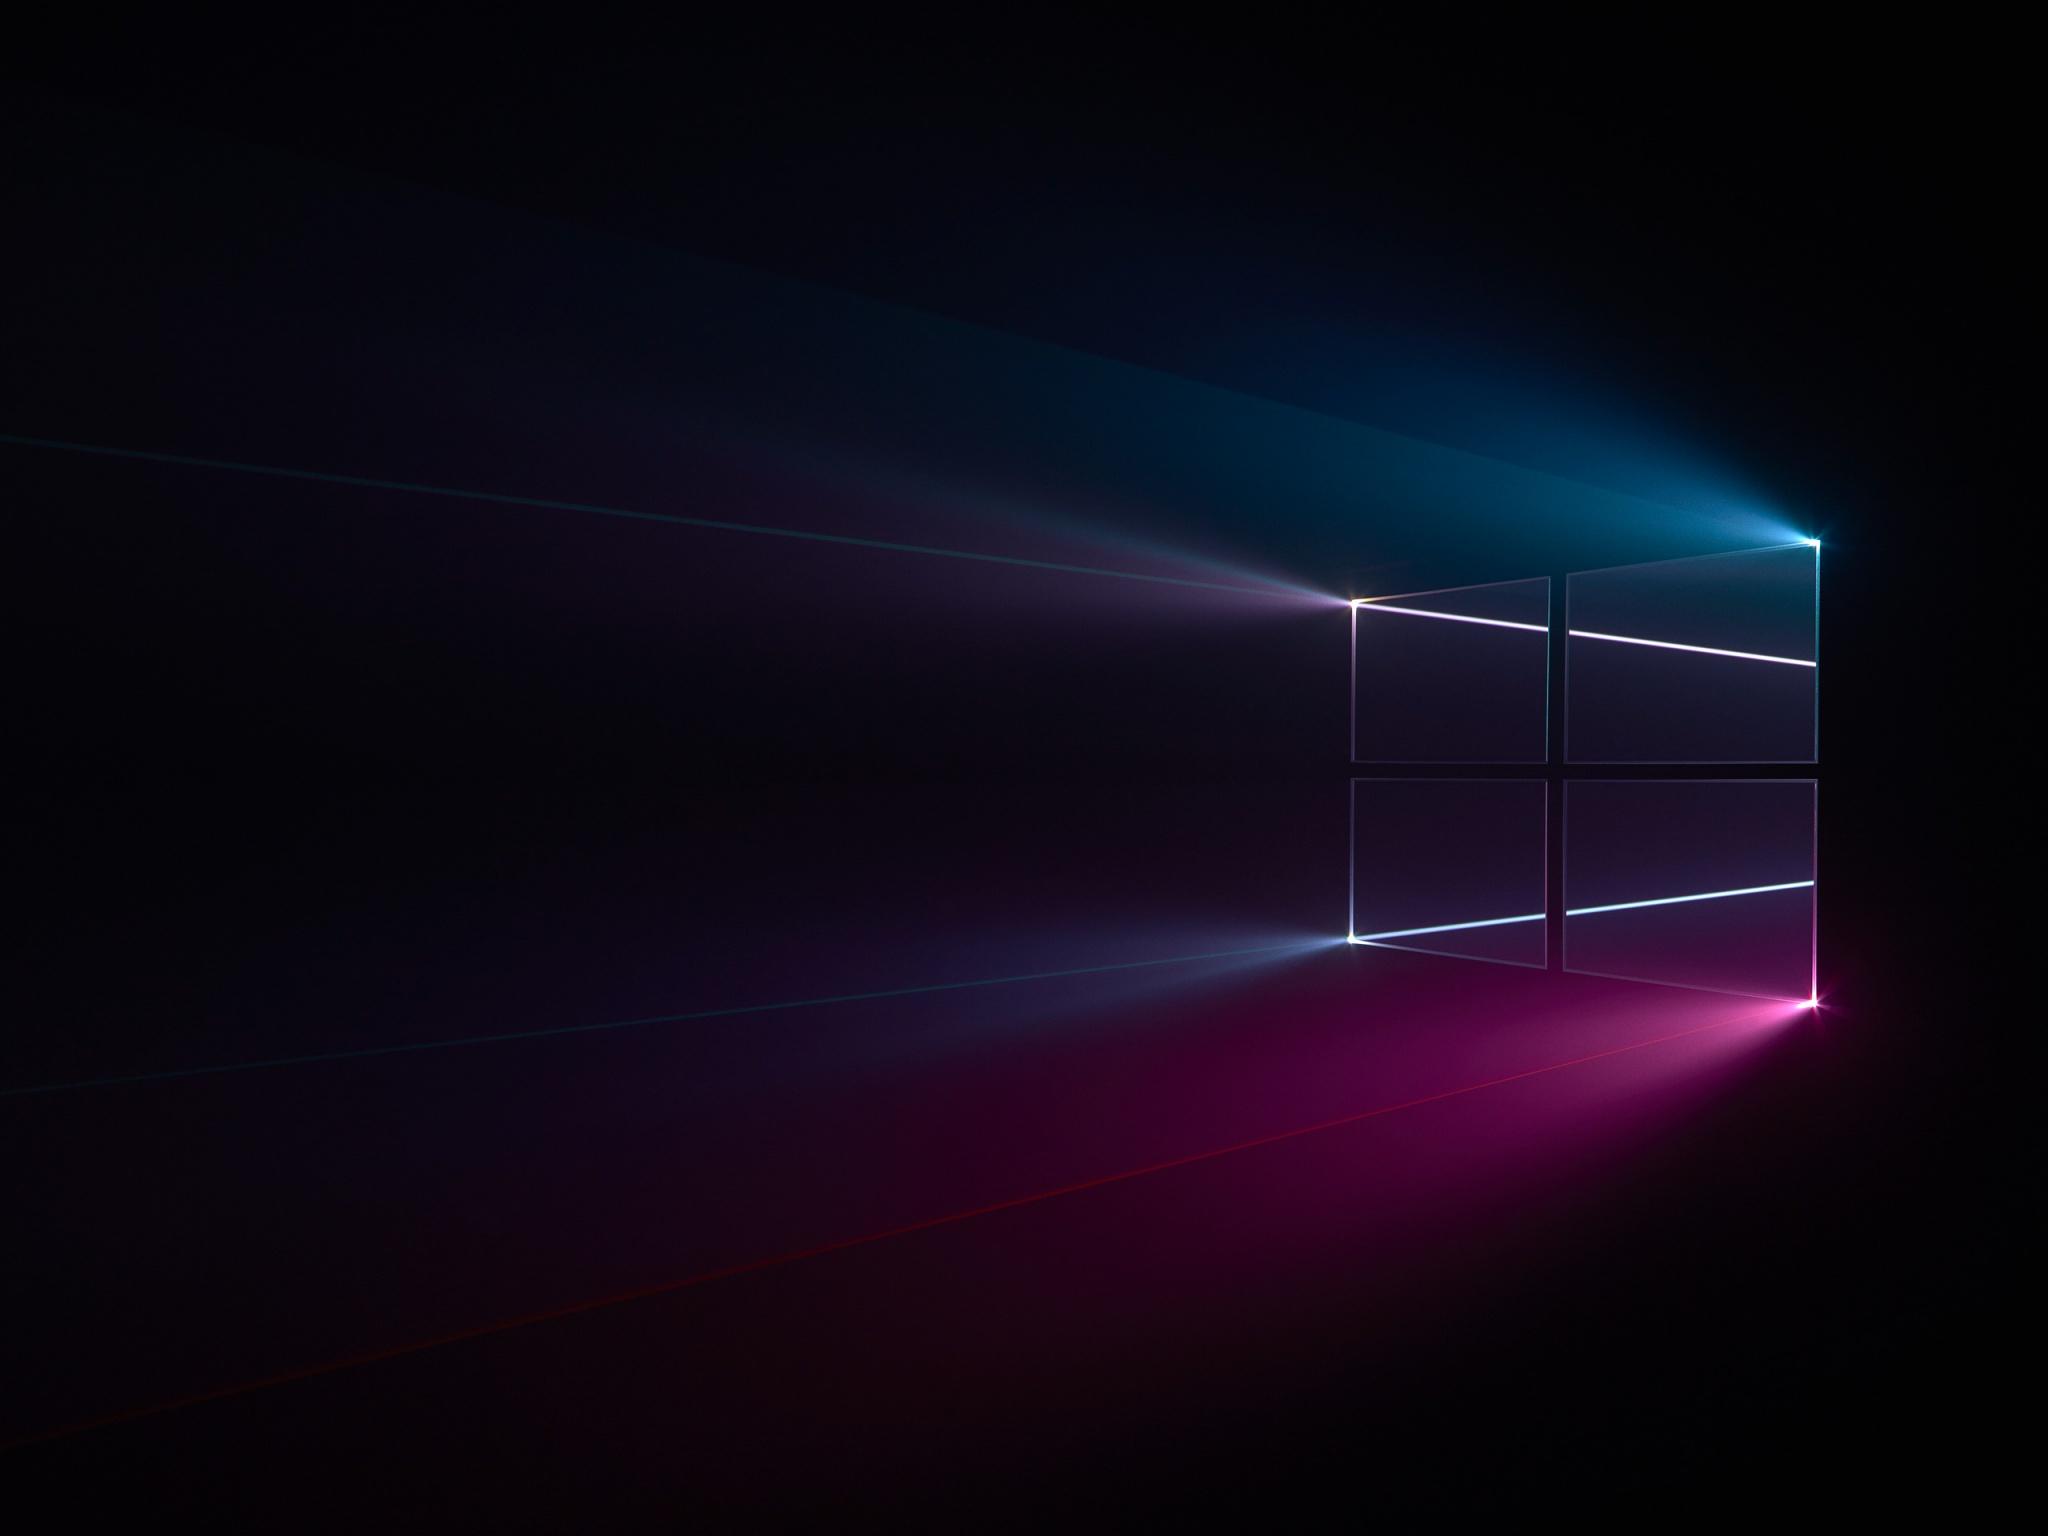 Windows 10 4k Wallpaper Microsoft Windows Colorful Black Background Technology 1552